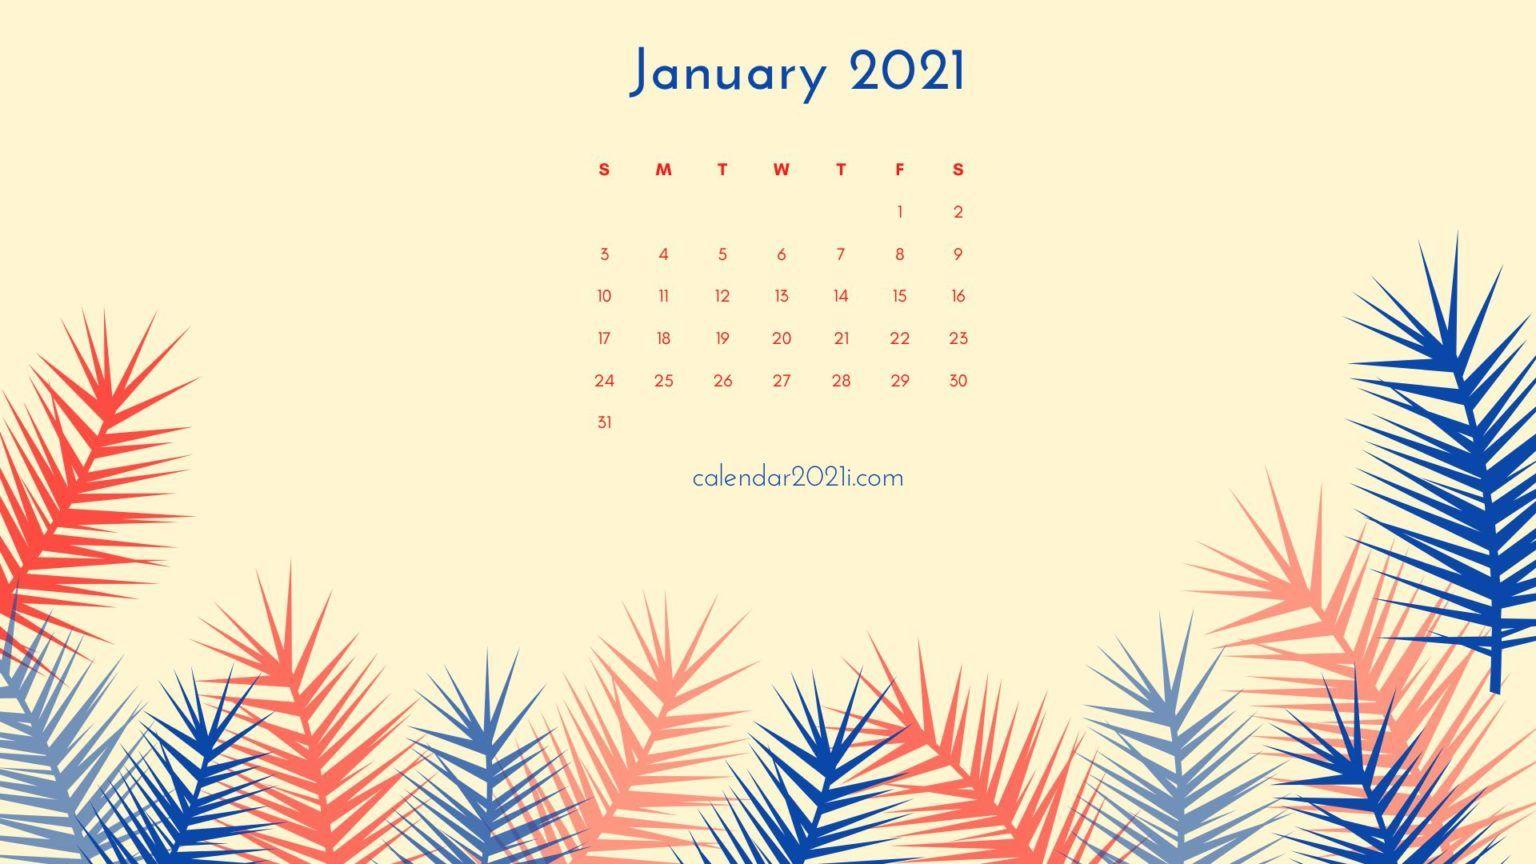 January 2021 Calendar Wallpapers Wallpaper Cave